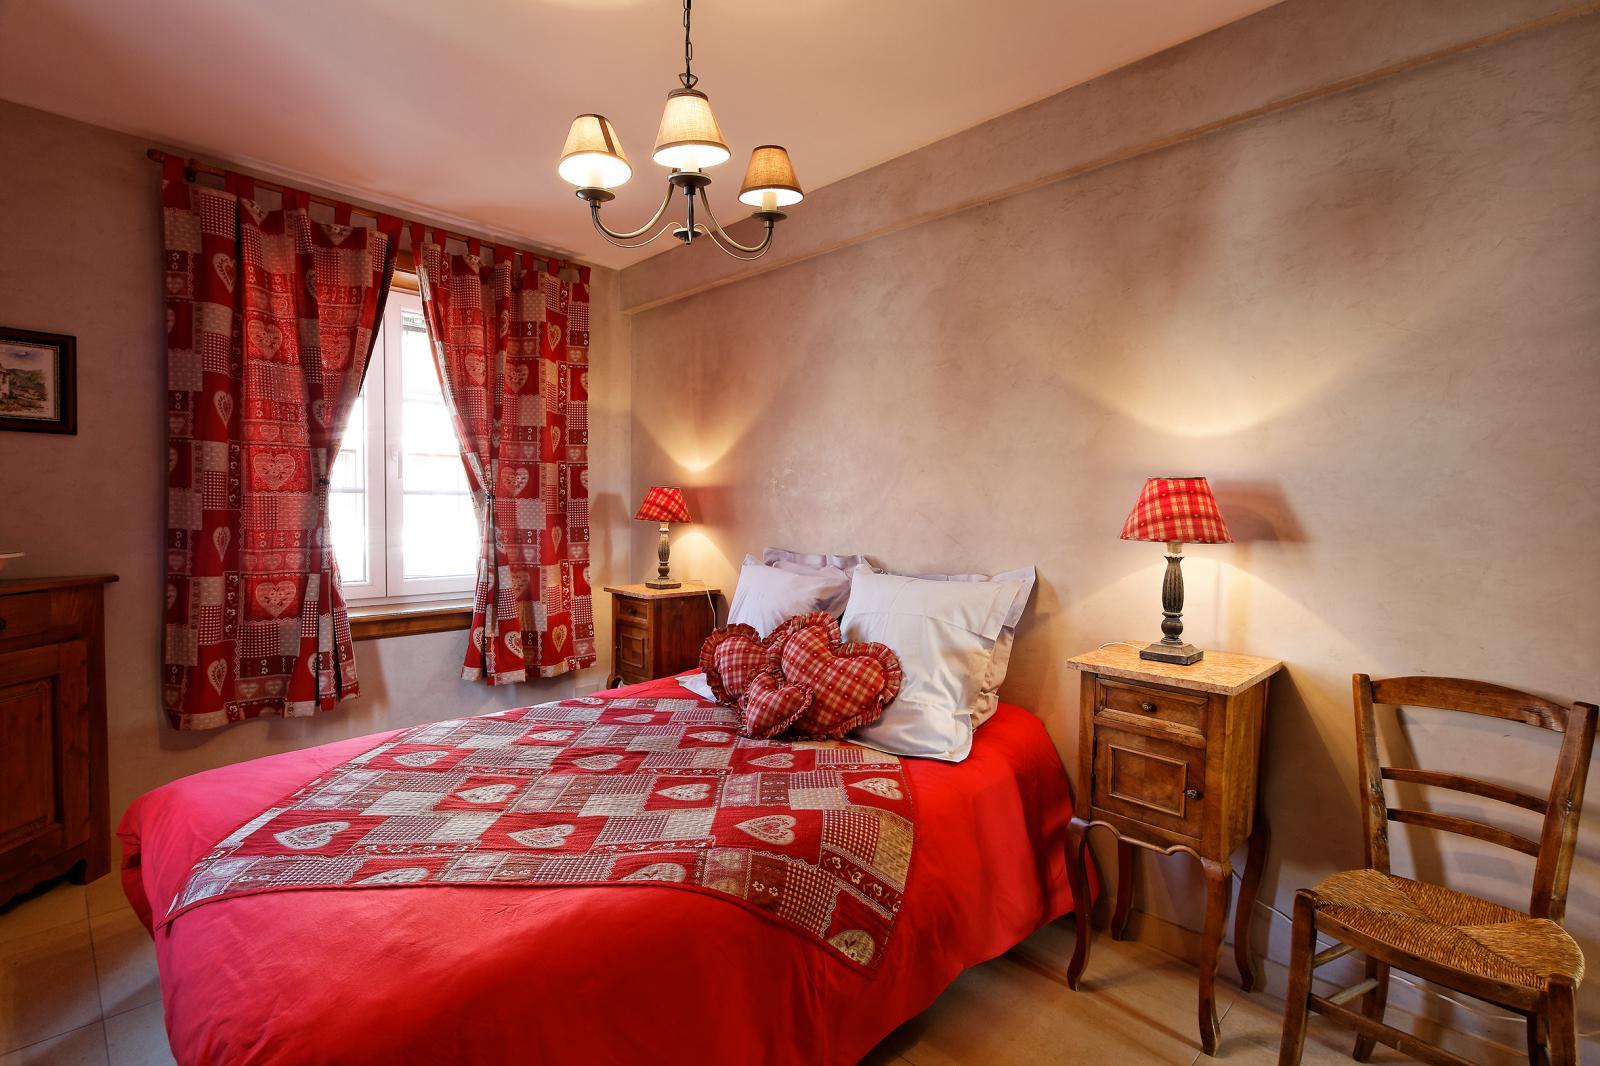 Gites chambres d 39 h tes locations de vacances bas for Chambre hote 67